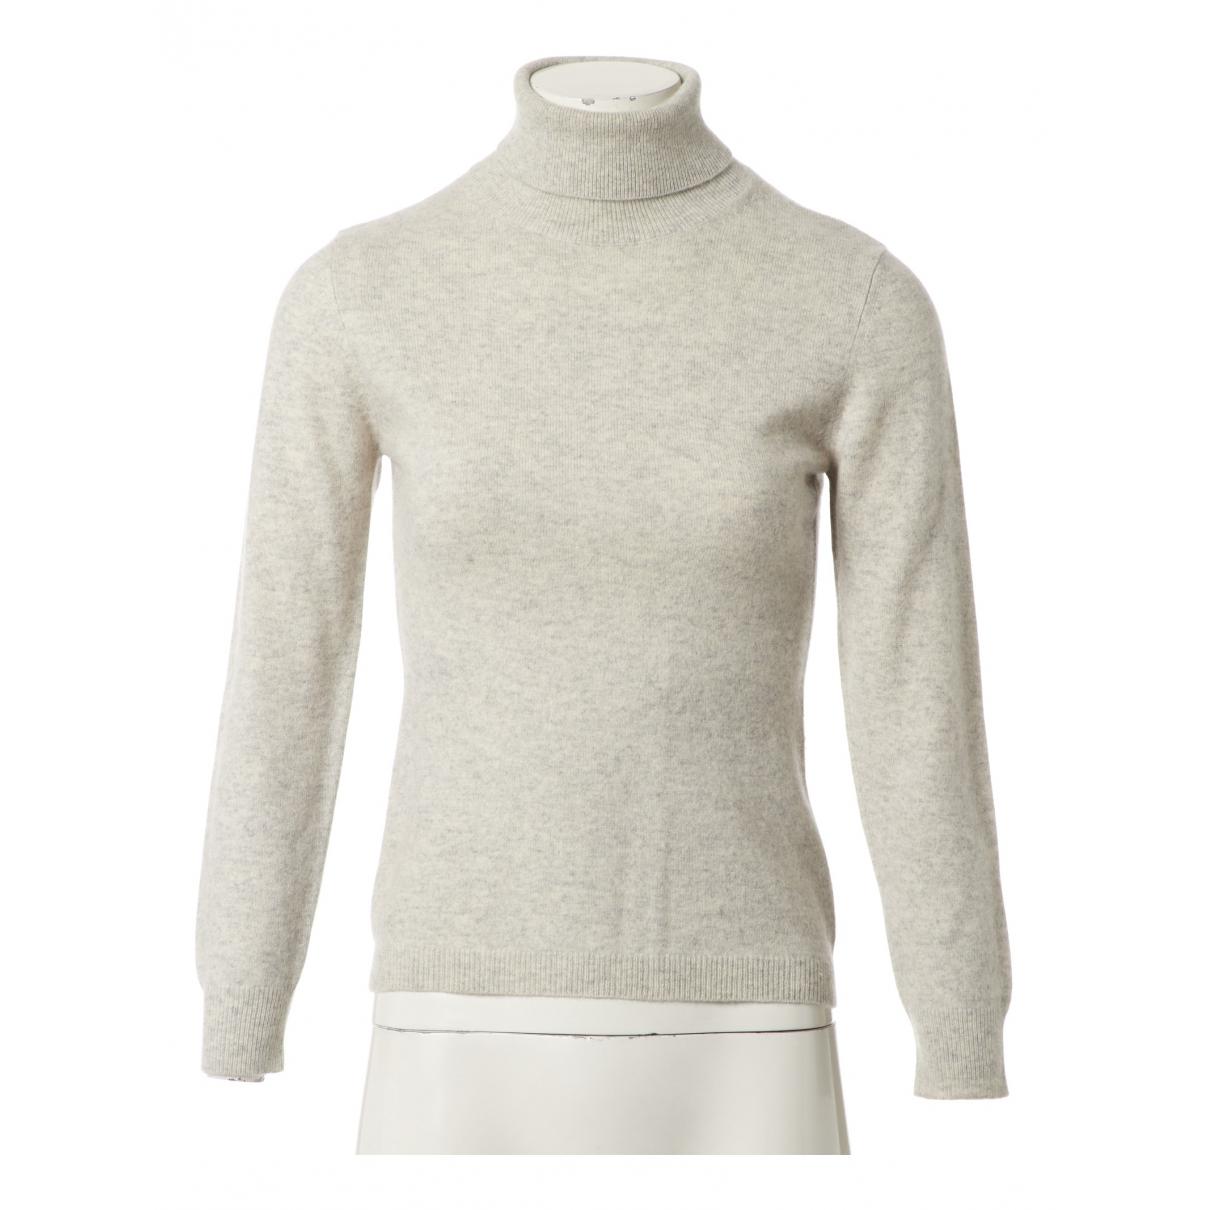 Eric Bompard N Grey Cashmere Knitwear for Women S International